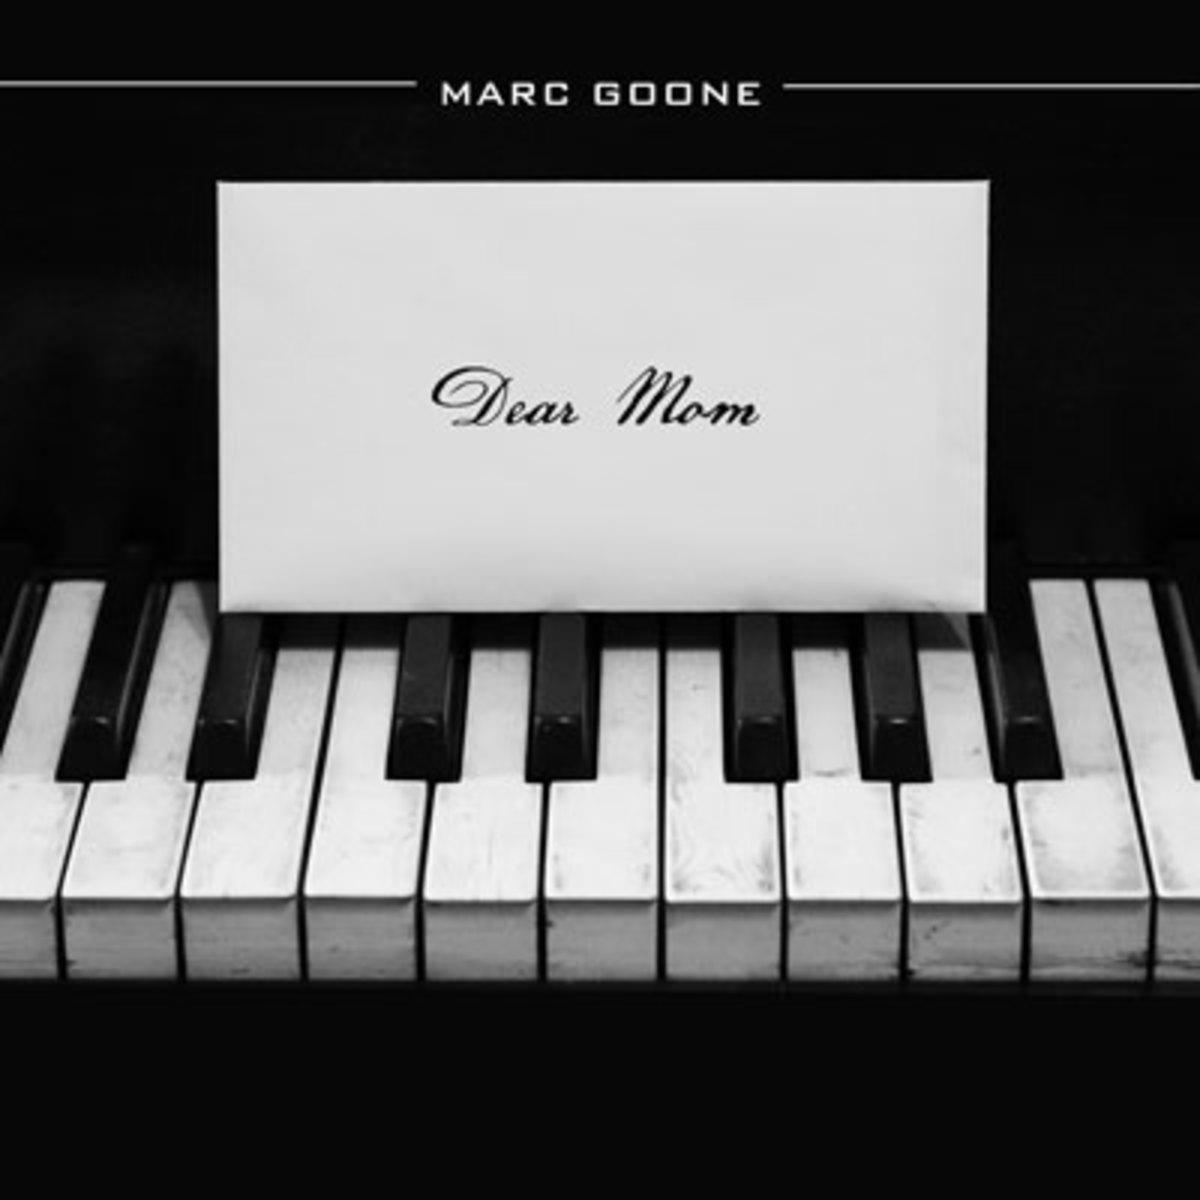 marcgoone-dearmom.jpg